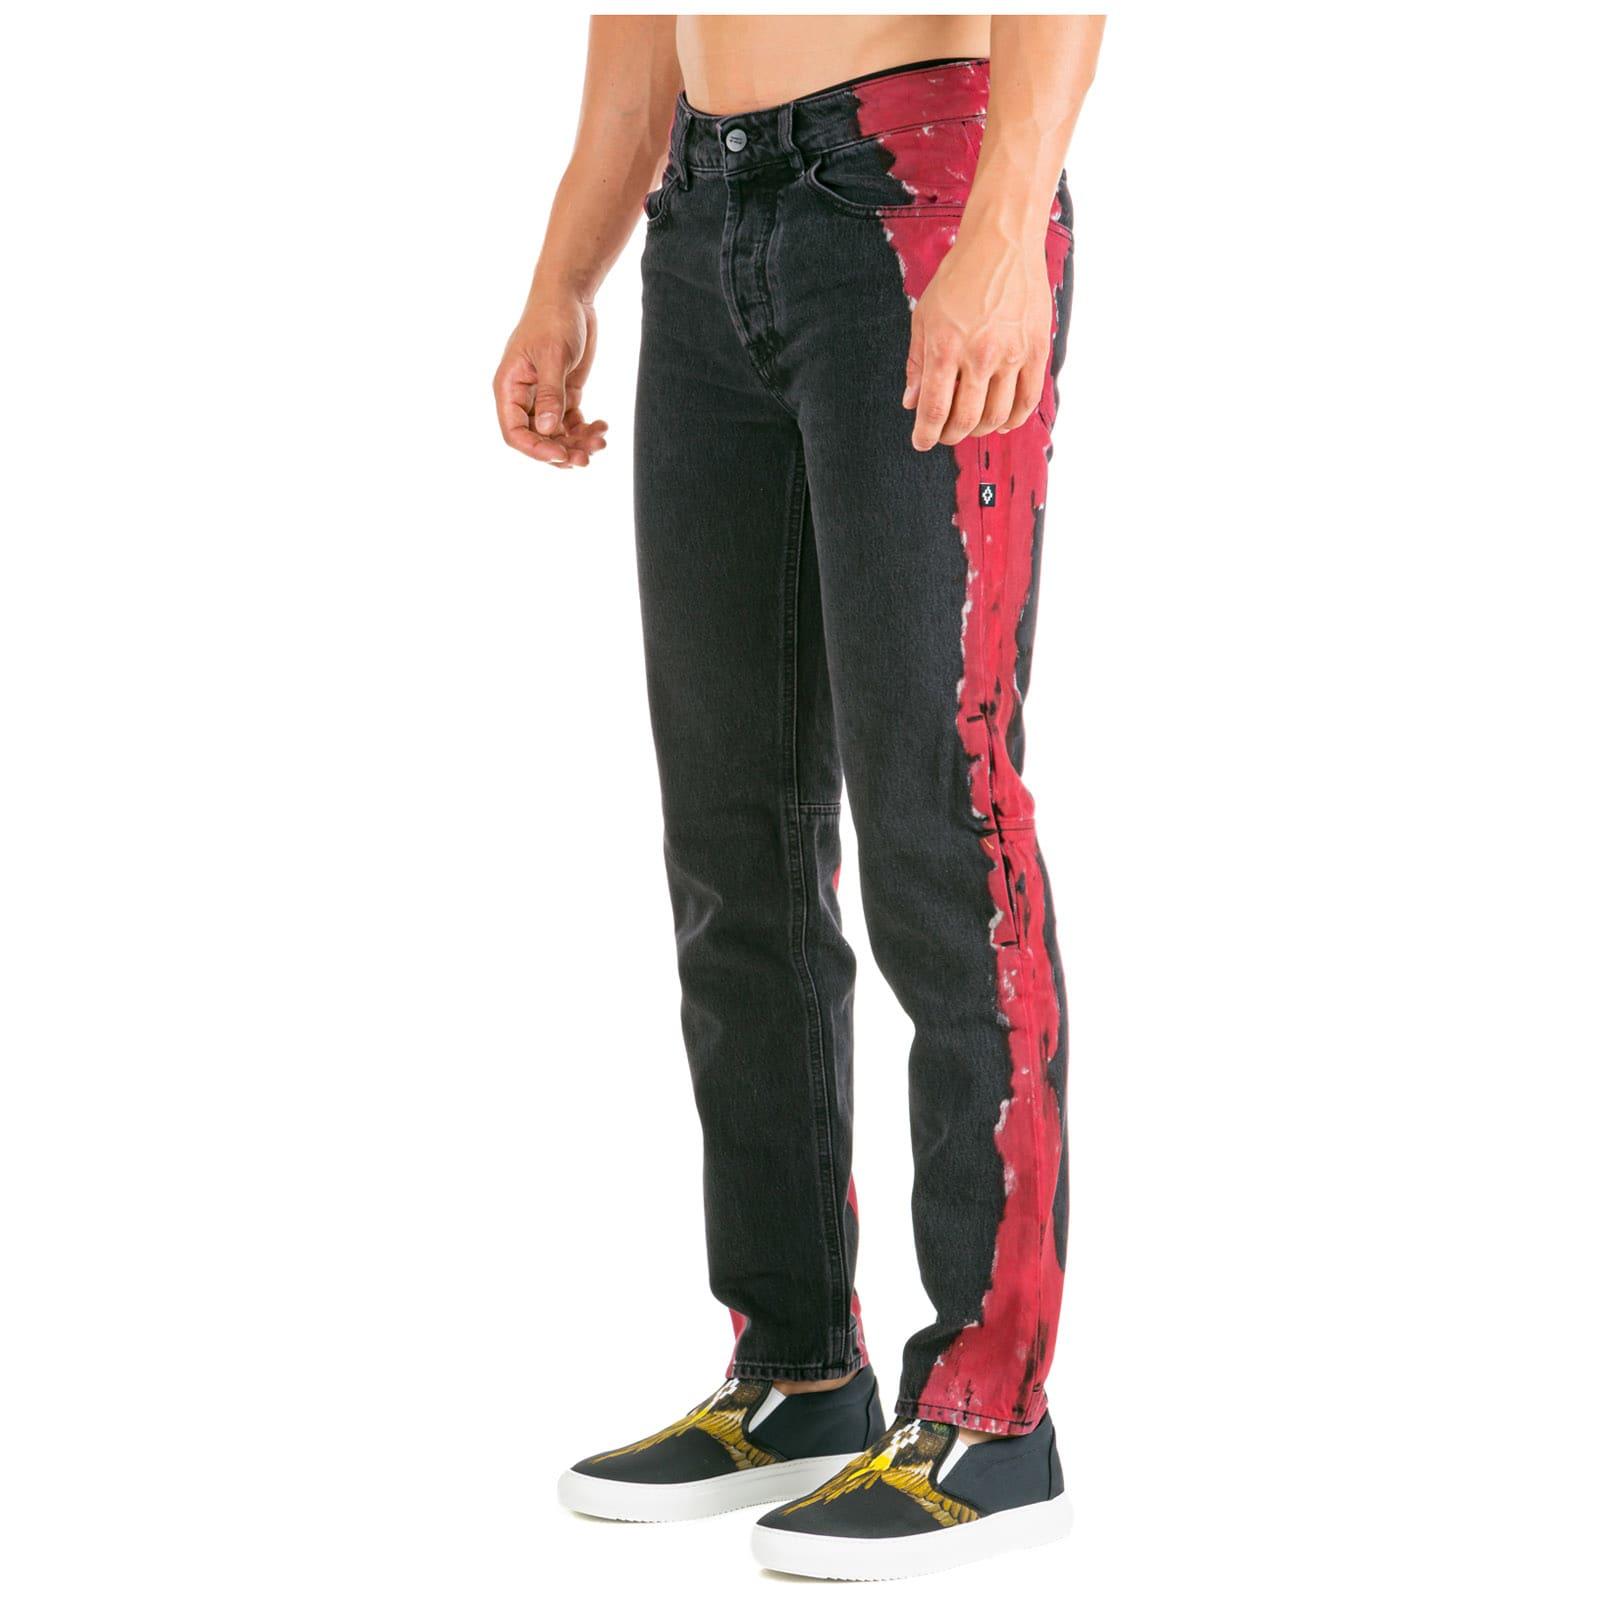 Sketch Jeans